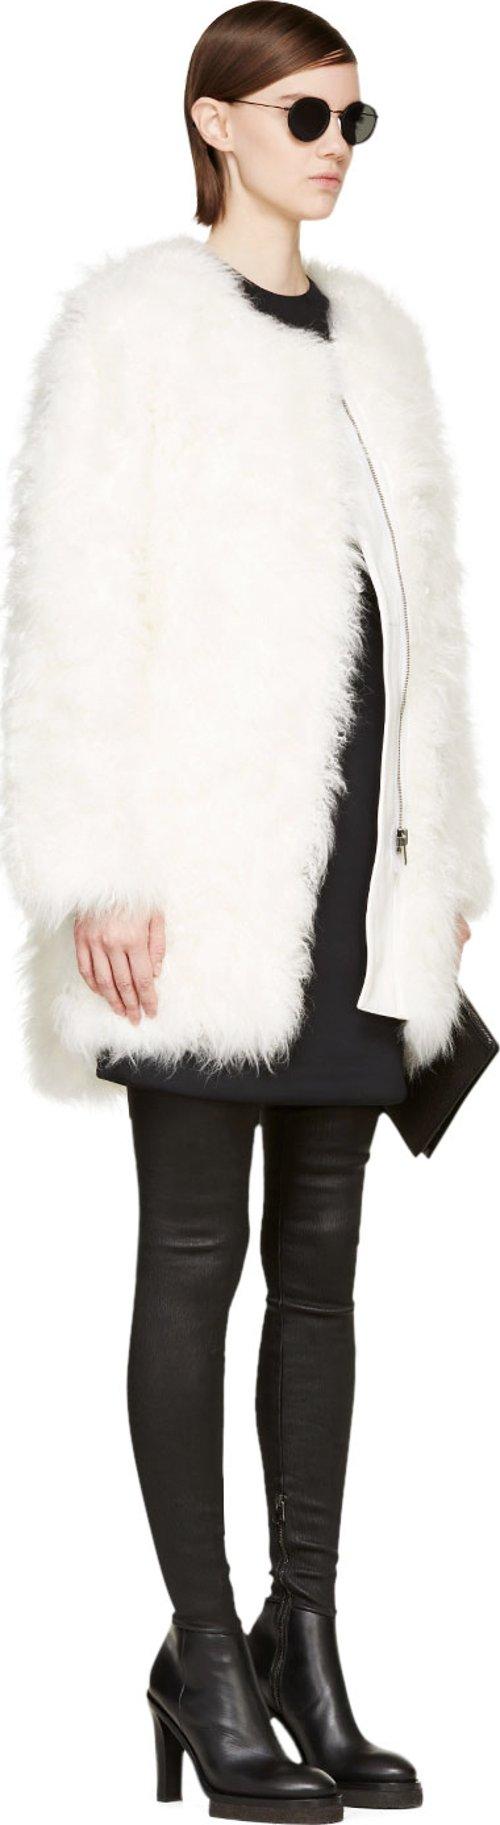 White Goat Fur Coat by Helmut Lang in Focus